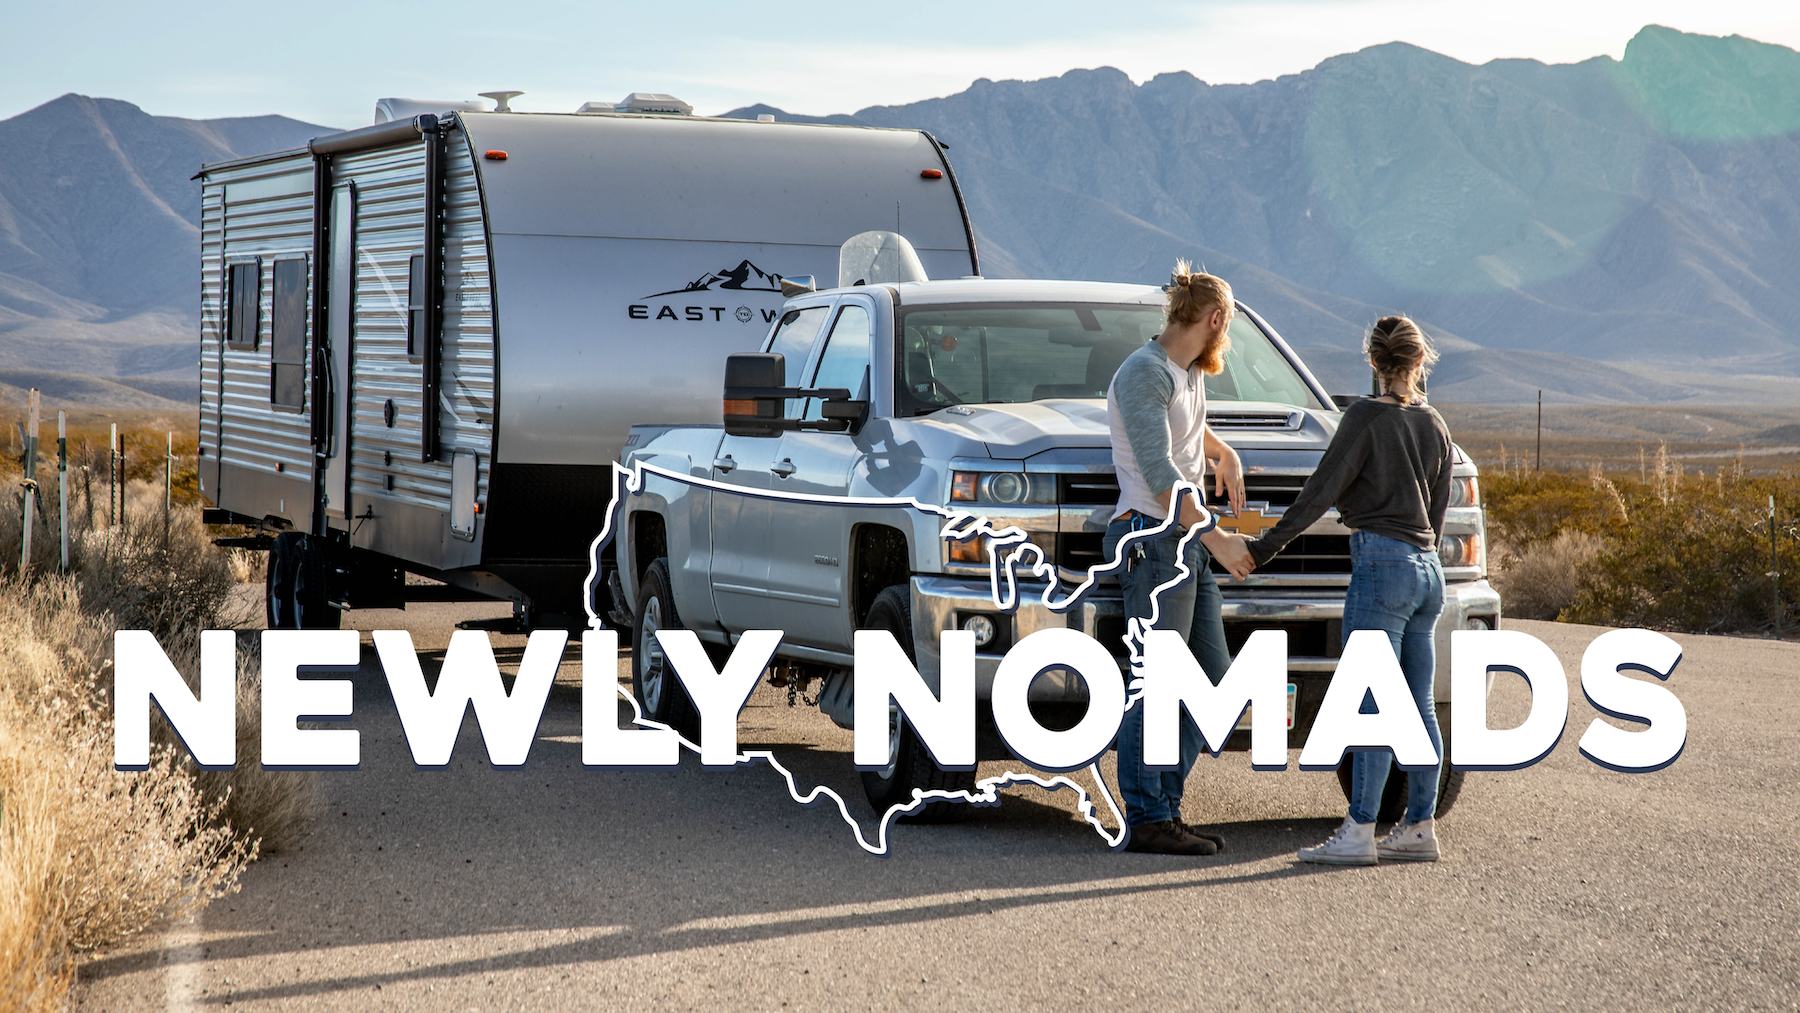 Wild Hixsons Newly Nomads header